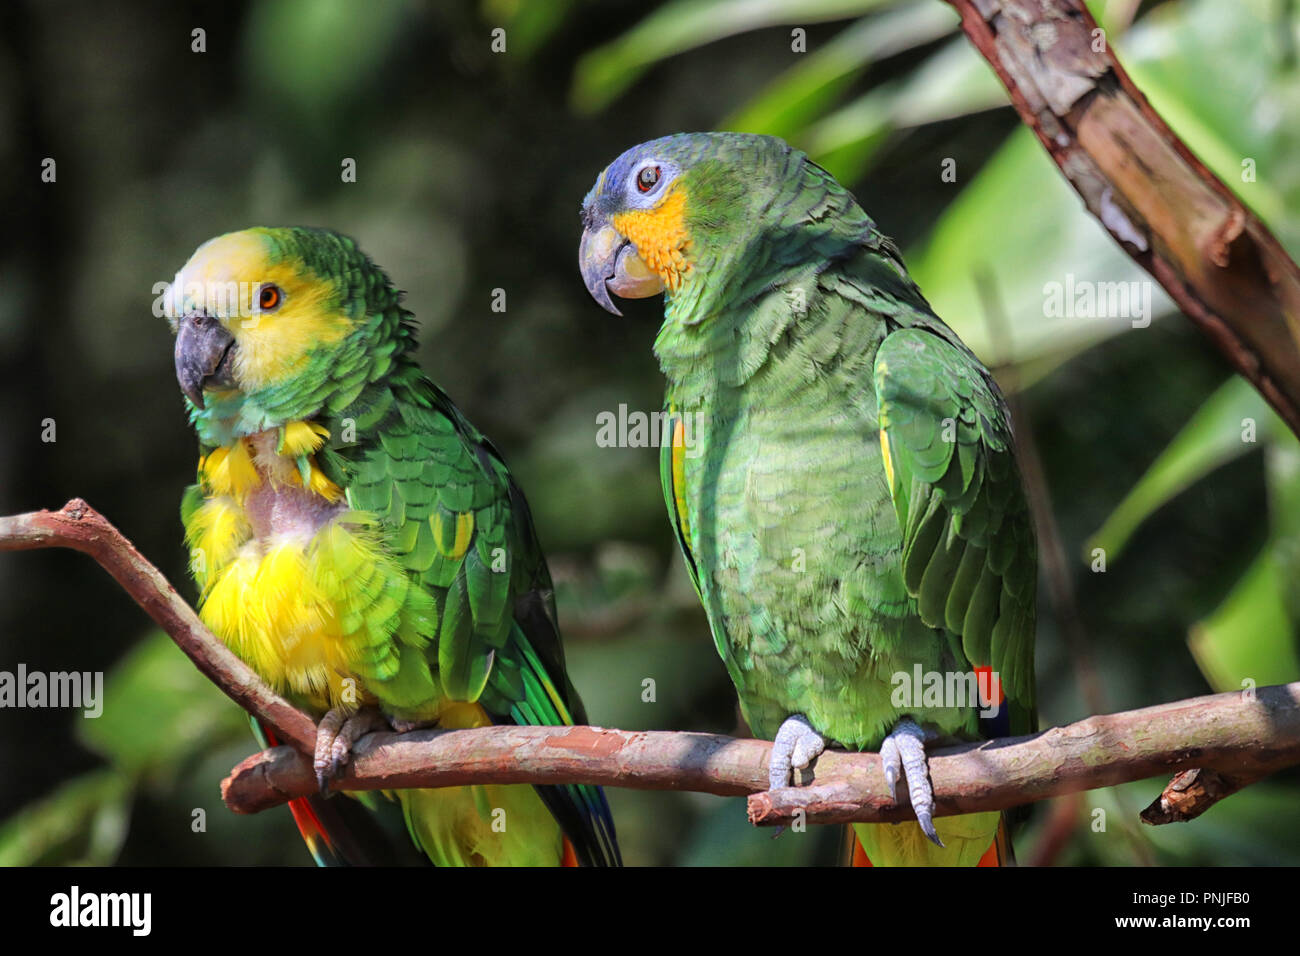 Parrot at Parque des Aves in Foz do Iguacu ( Brazil ) - Stock Image